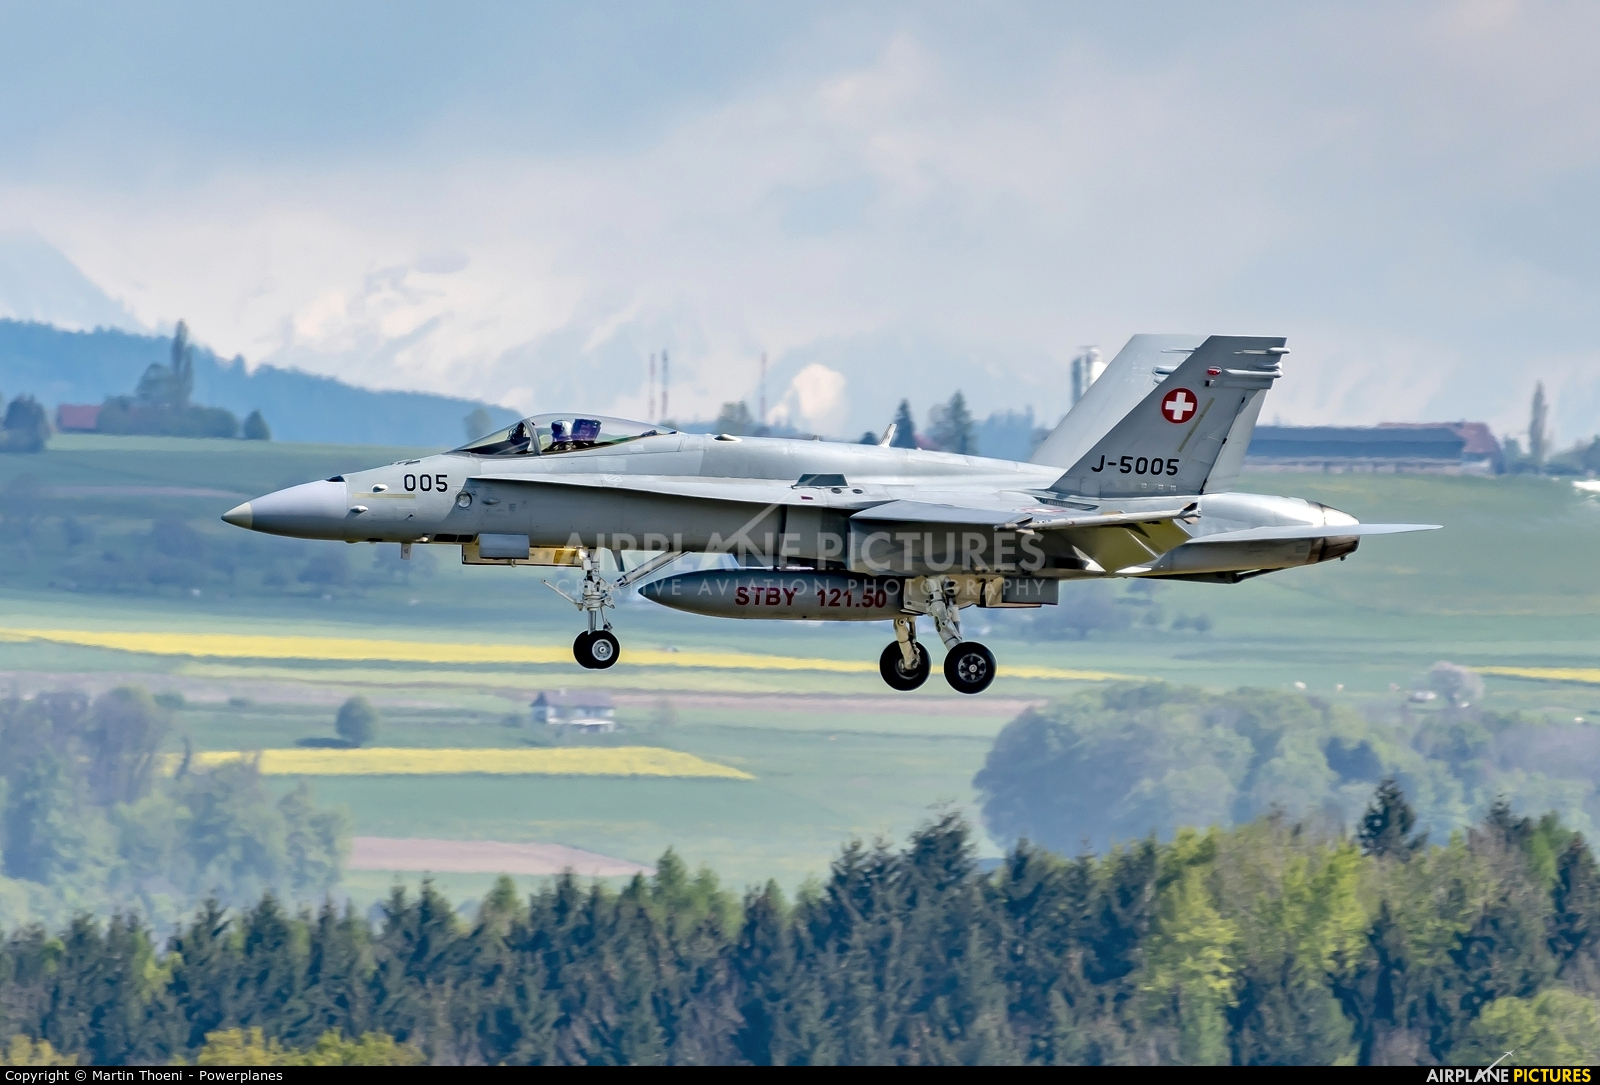 Switzerland - Air Force J-5005 aircraft at Payerne